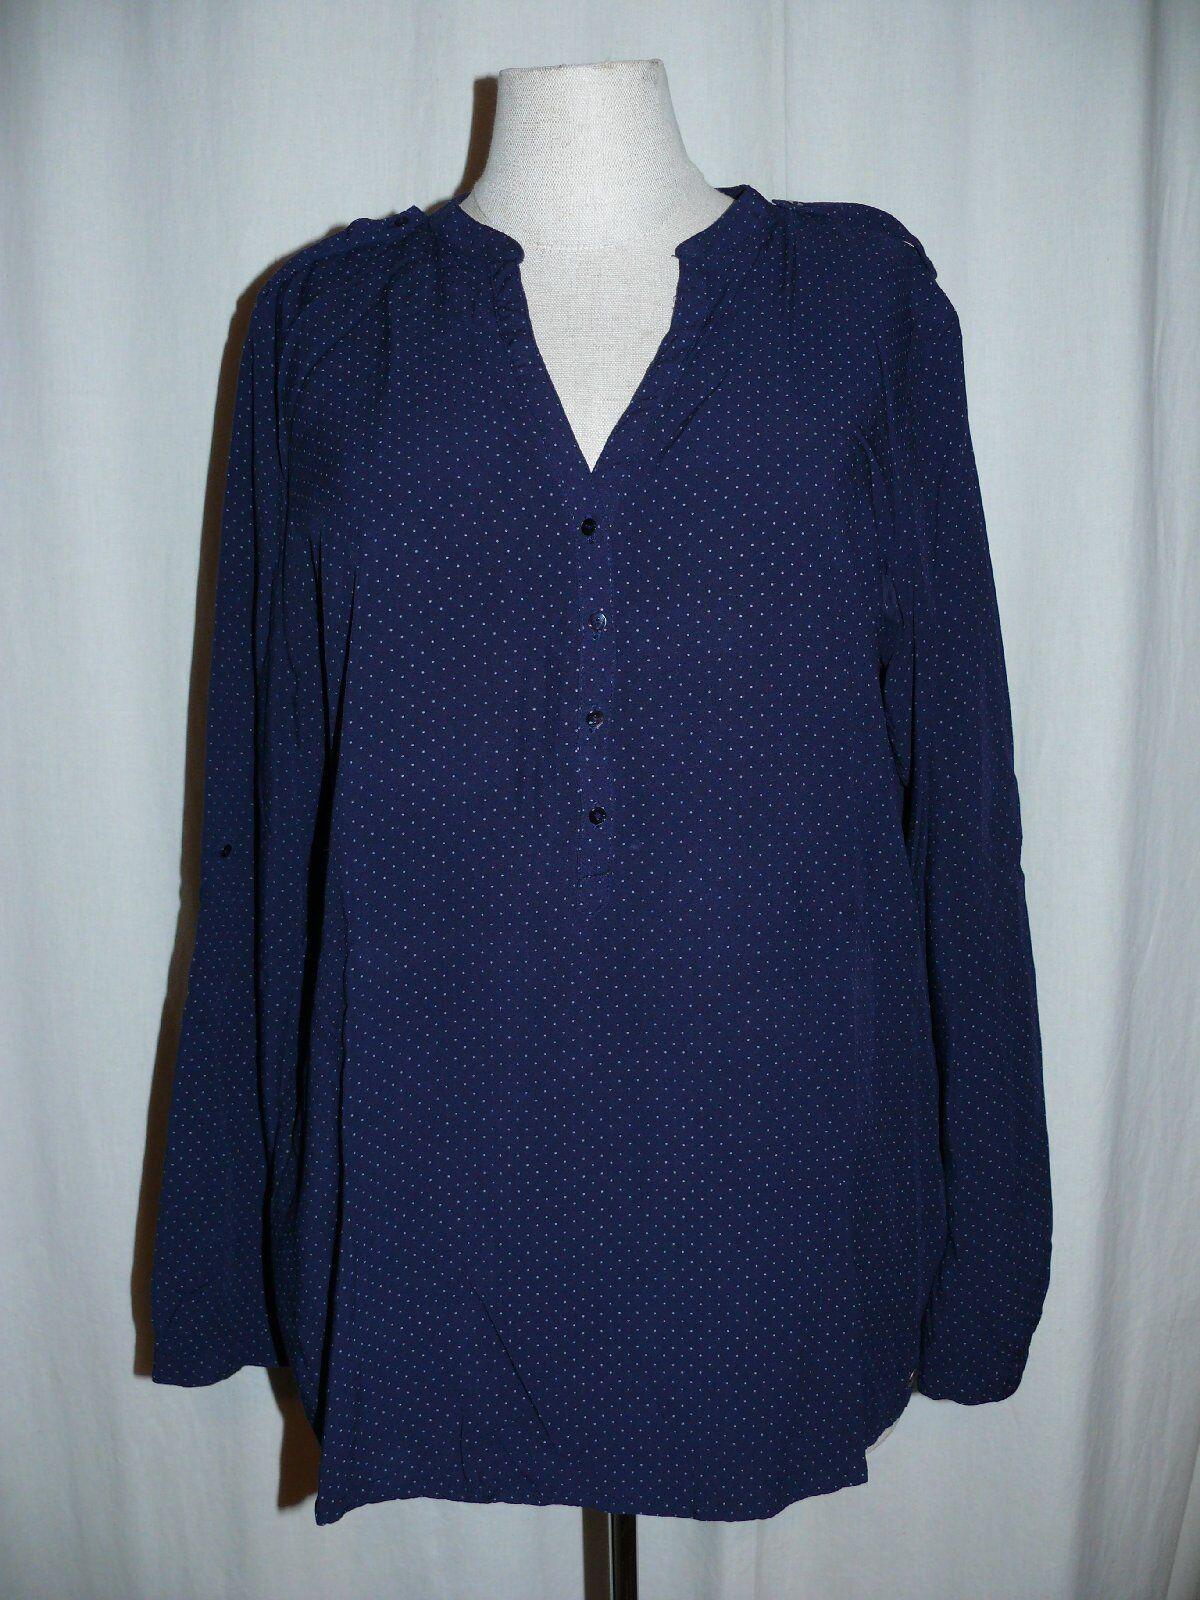 Esprit Fashionable Slip-Over Blouse Blouse Shirt Blouse Dots 38 Dark bluee